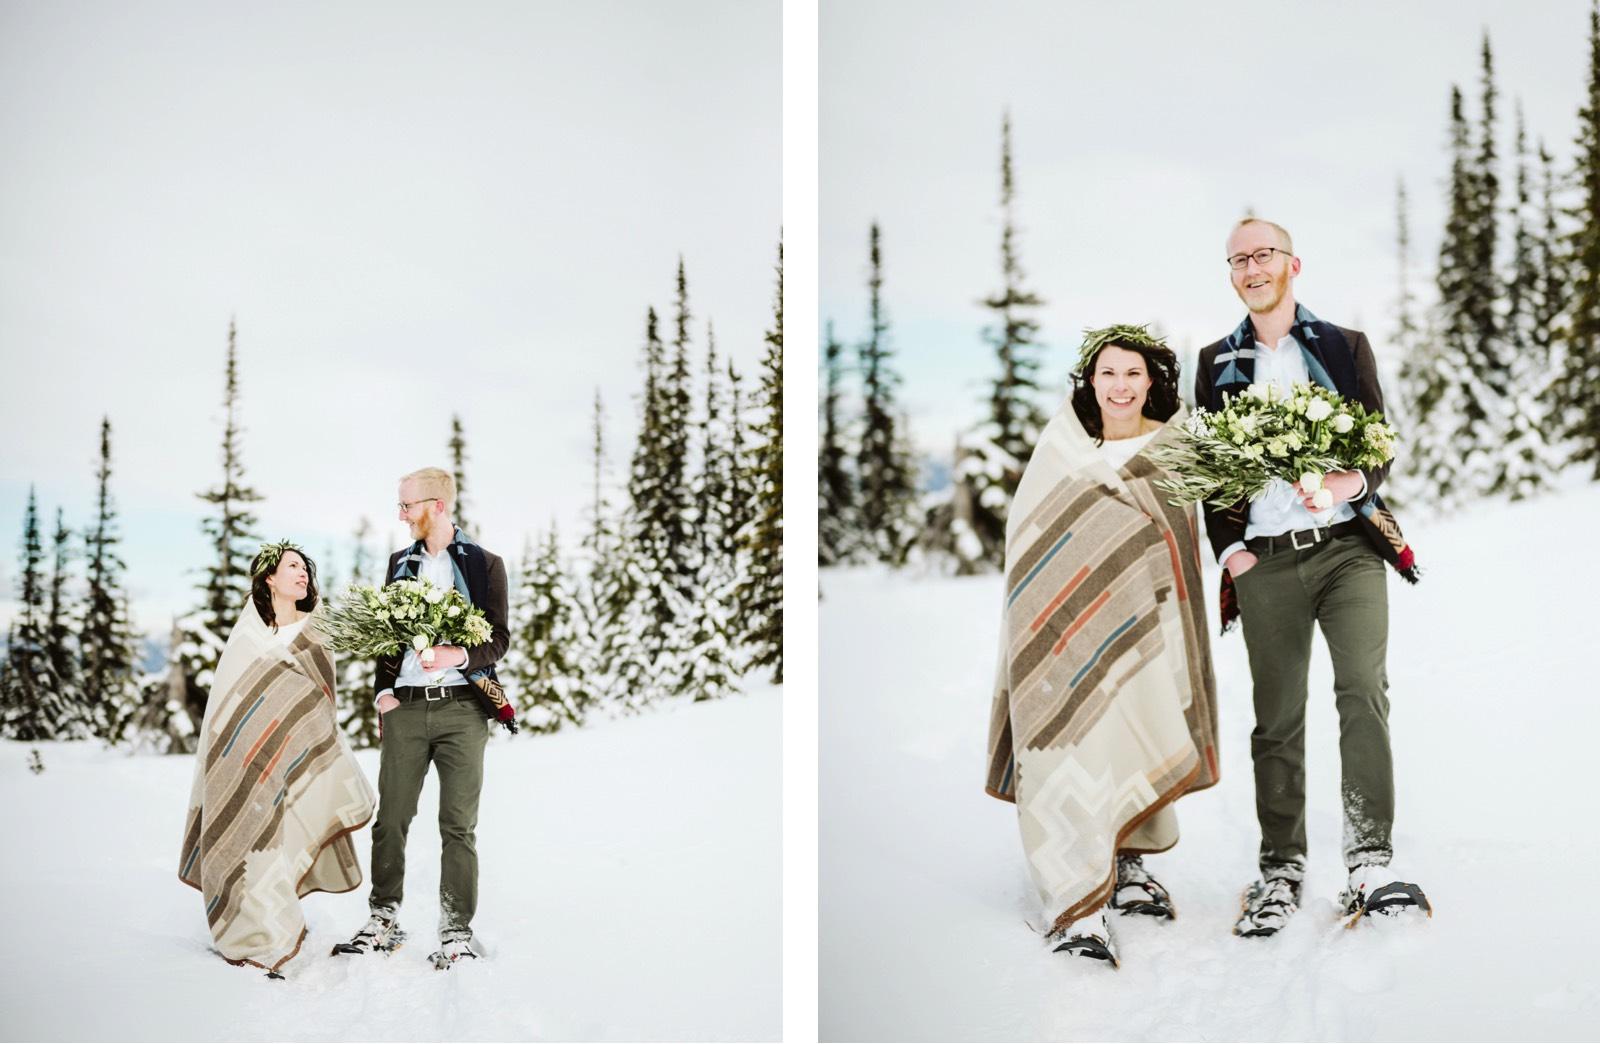 alpine-lakes-high-camp-winter-wedding-63 ALPINE LAKES HIGH CAMP WEDDING